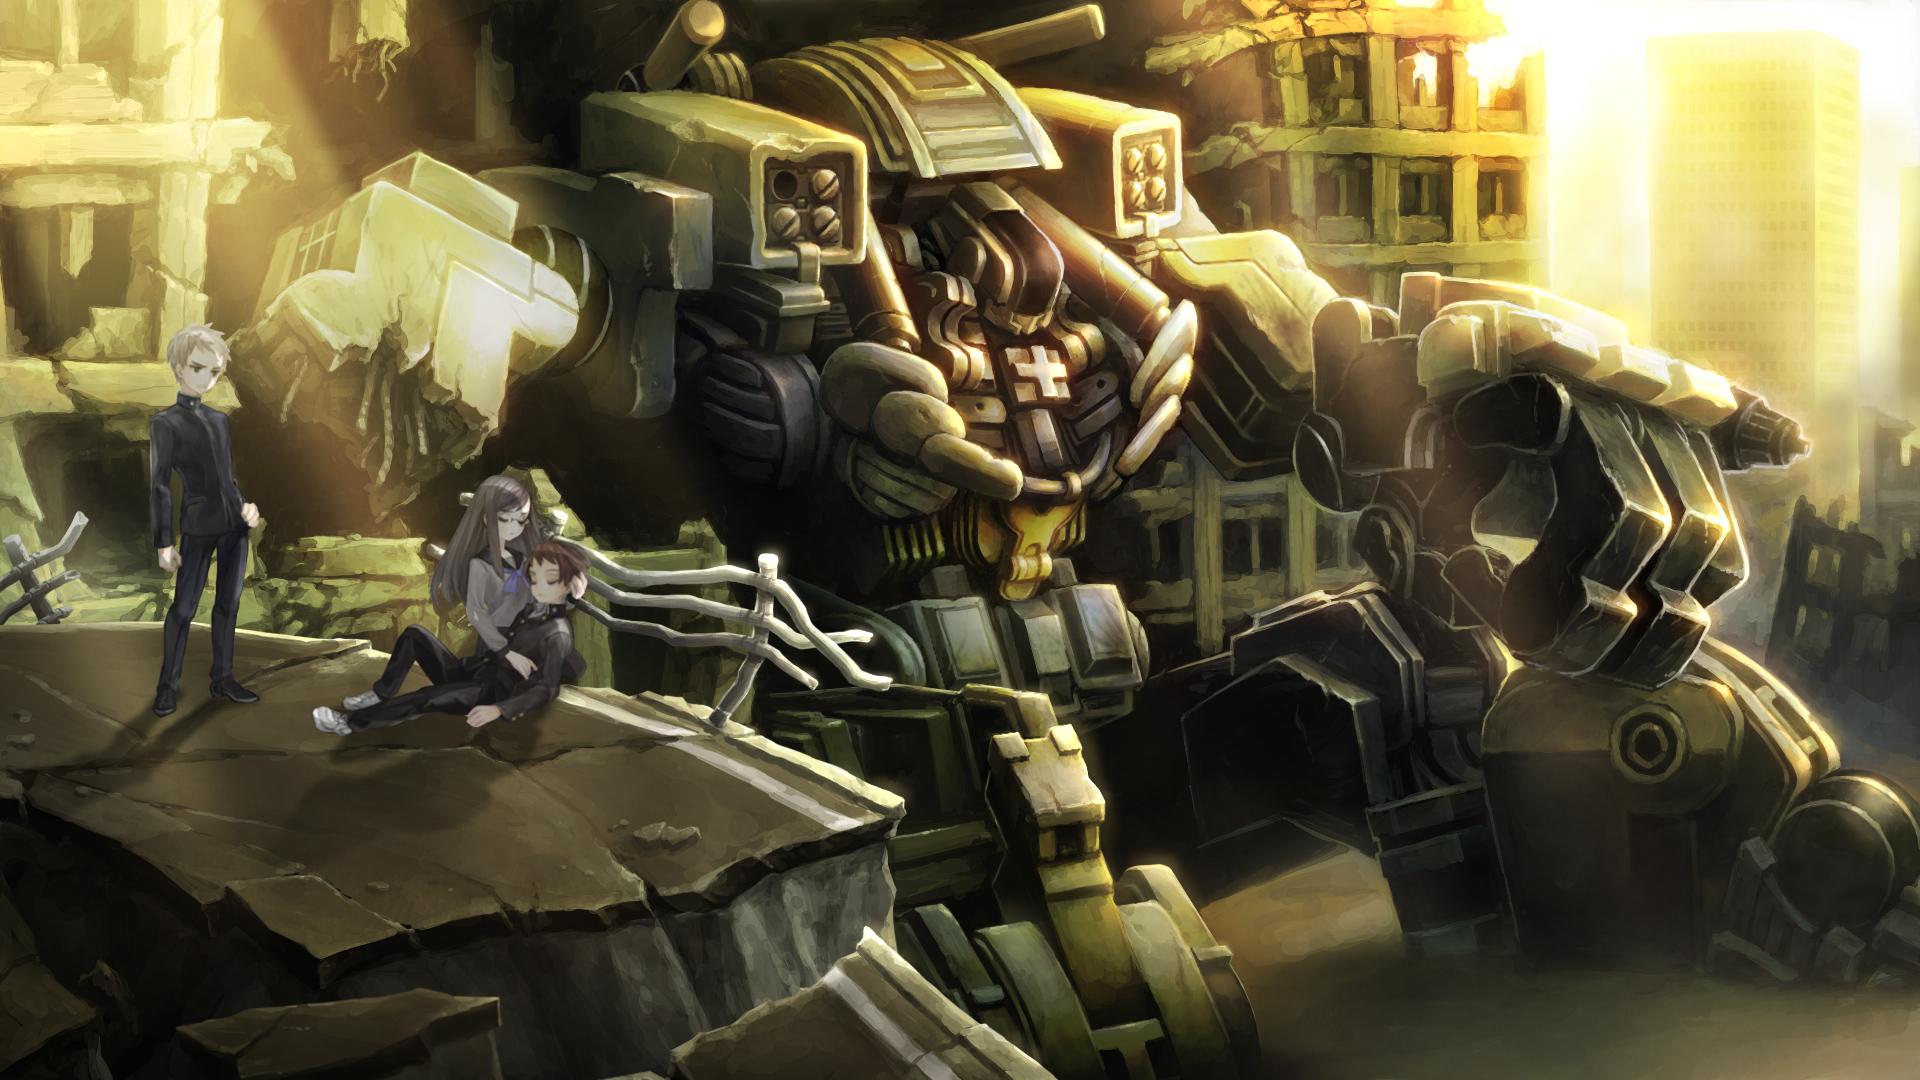 13 Sentinels Aegis Rim Screen 2